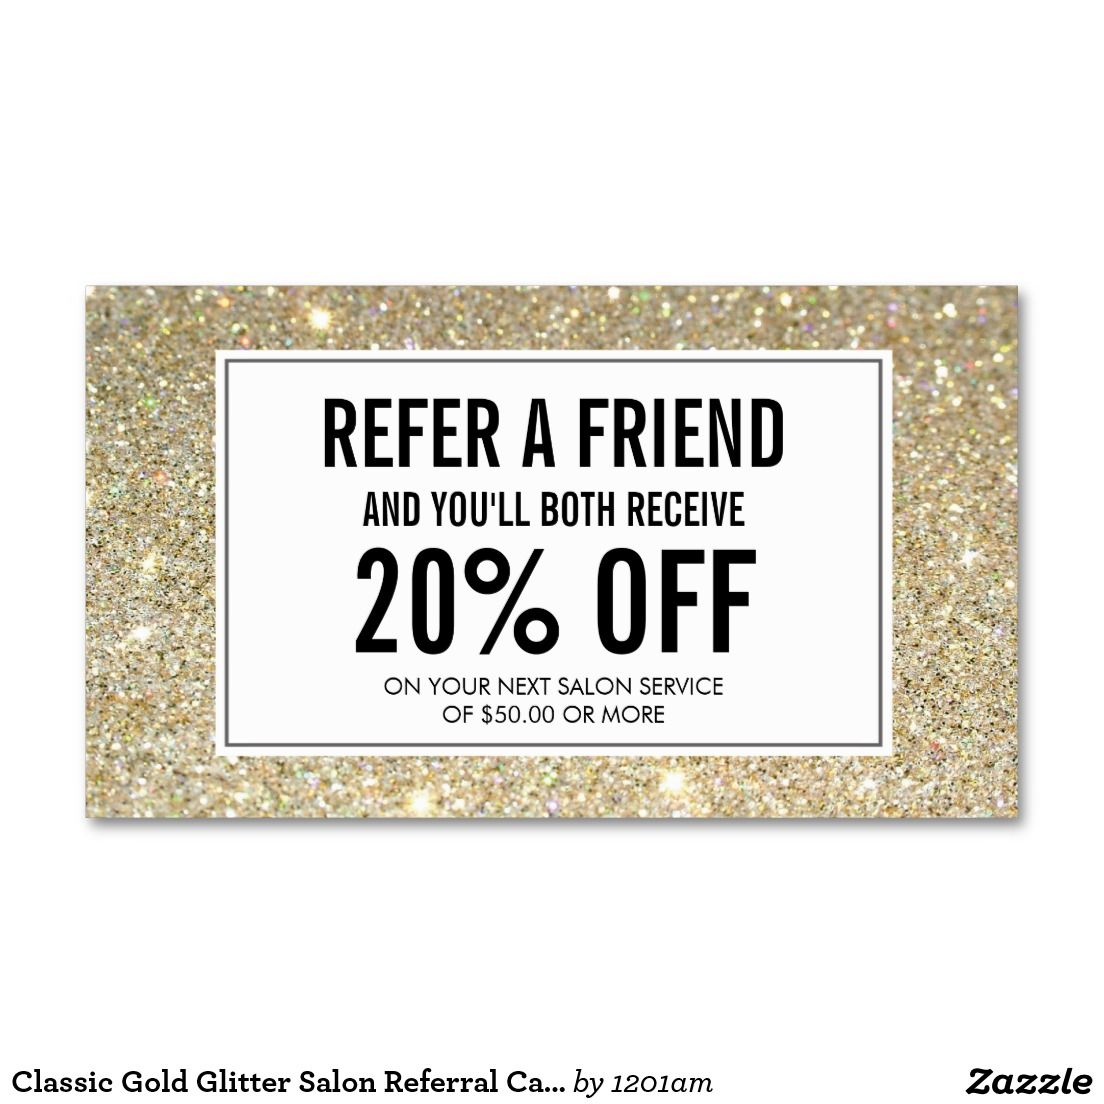 Classic Gold Glitter Salon Referral Card | Gold glitter, Business ...